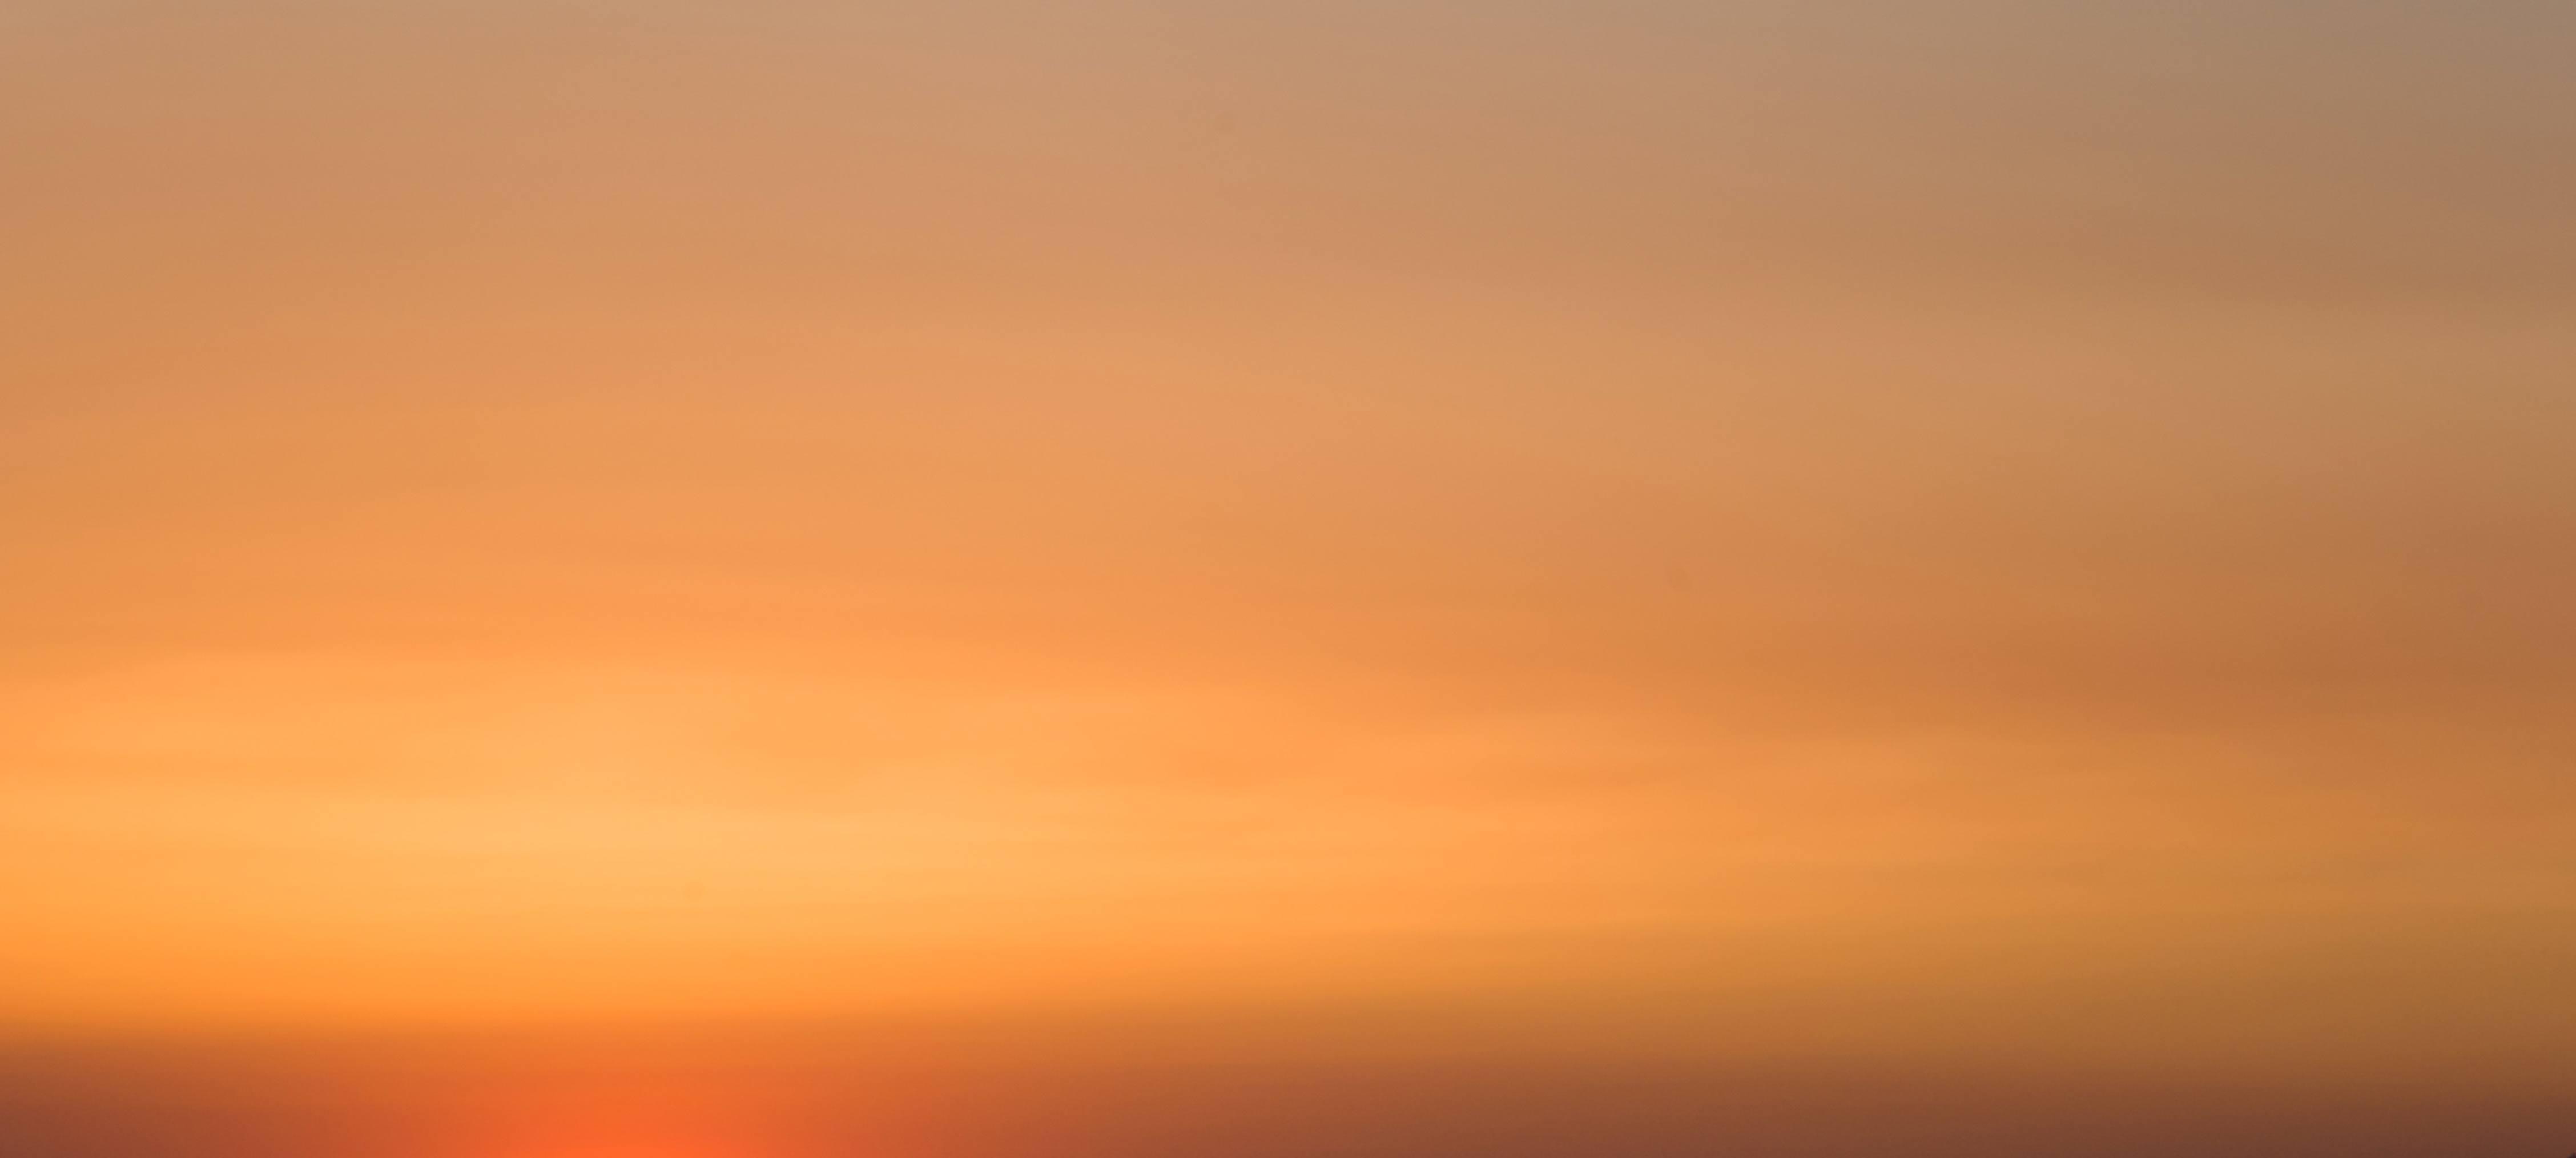 Soft Glowing Evening Sunset Sky